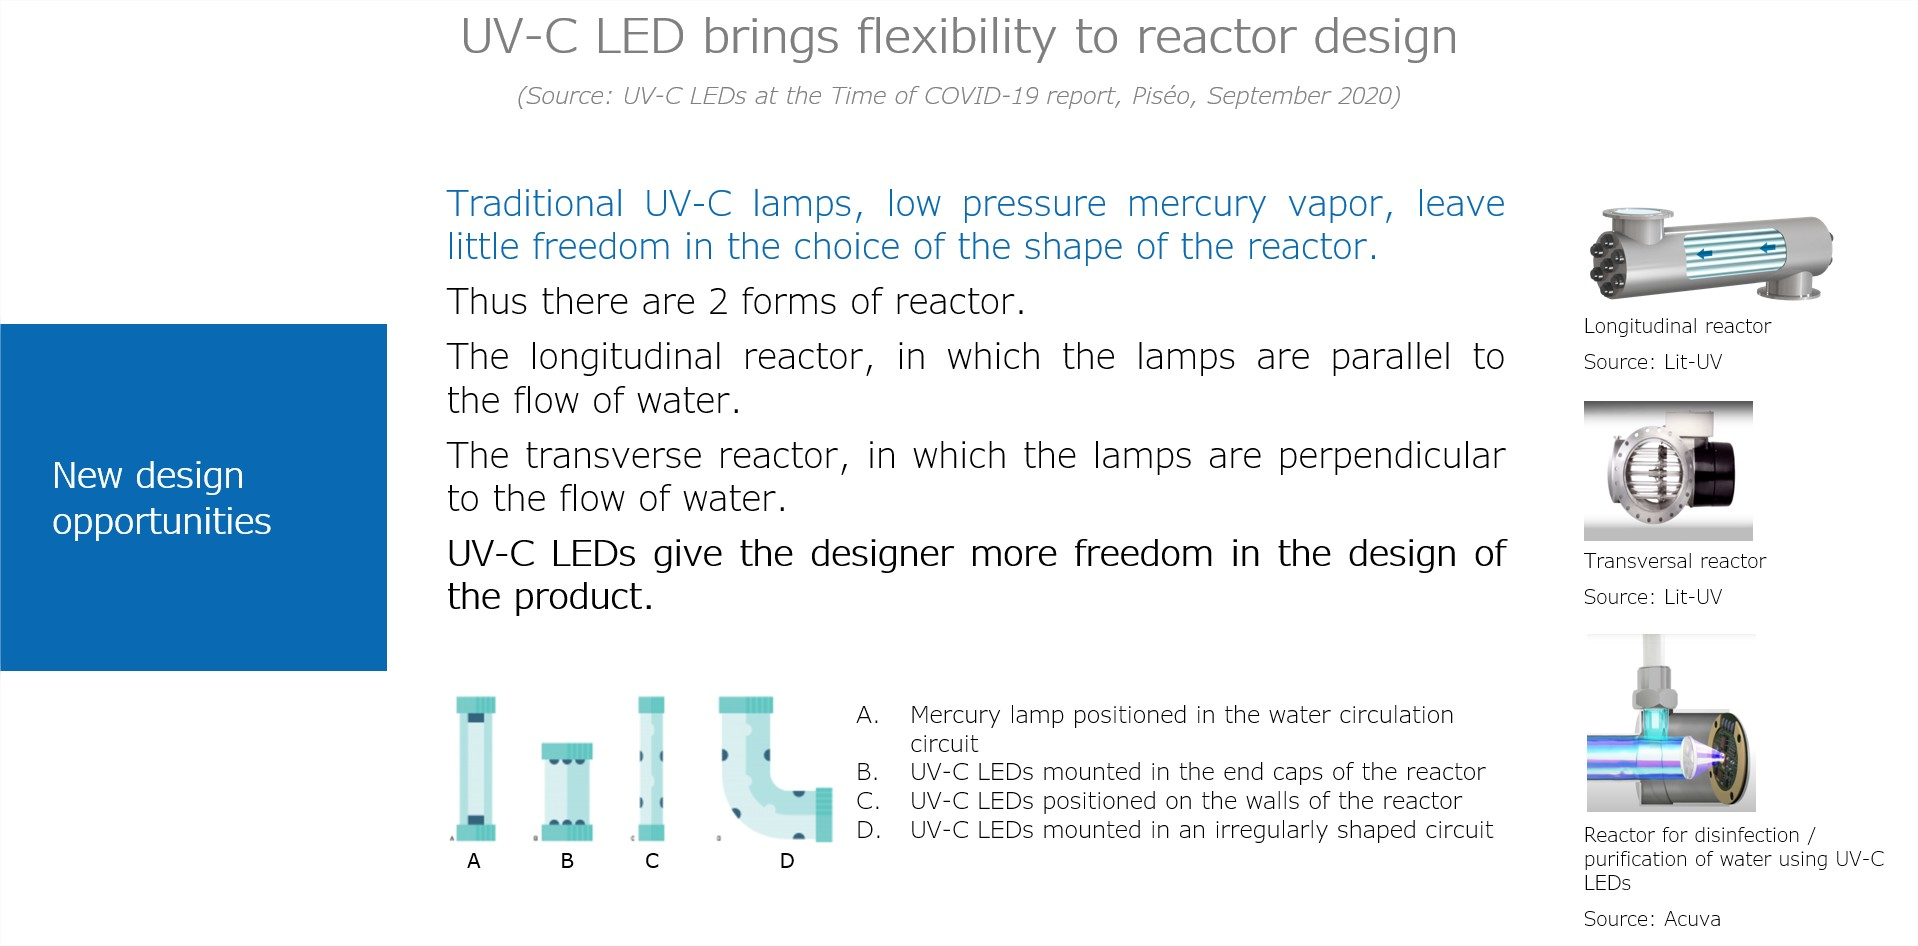 UV-C LED brings flexibility to reactor desgin_Piseo